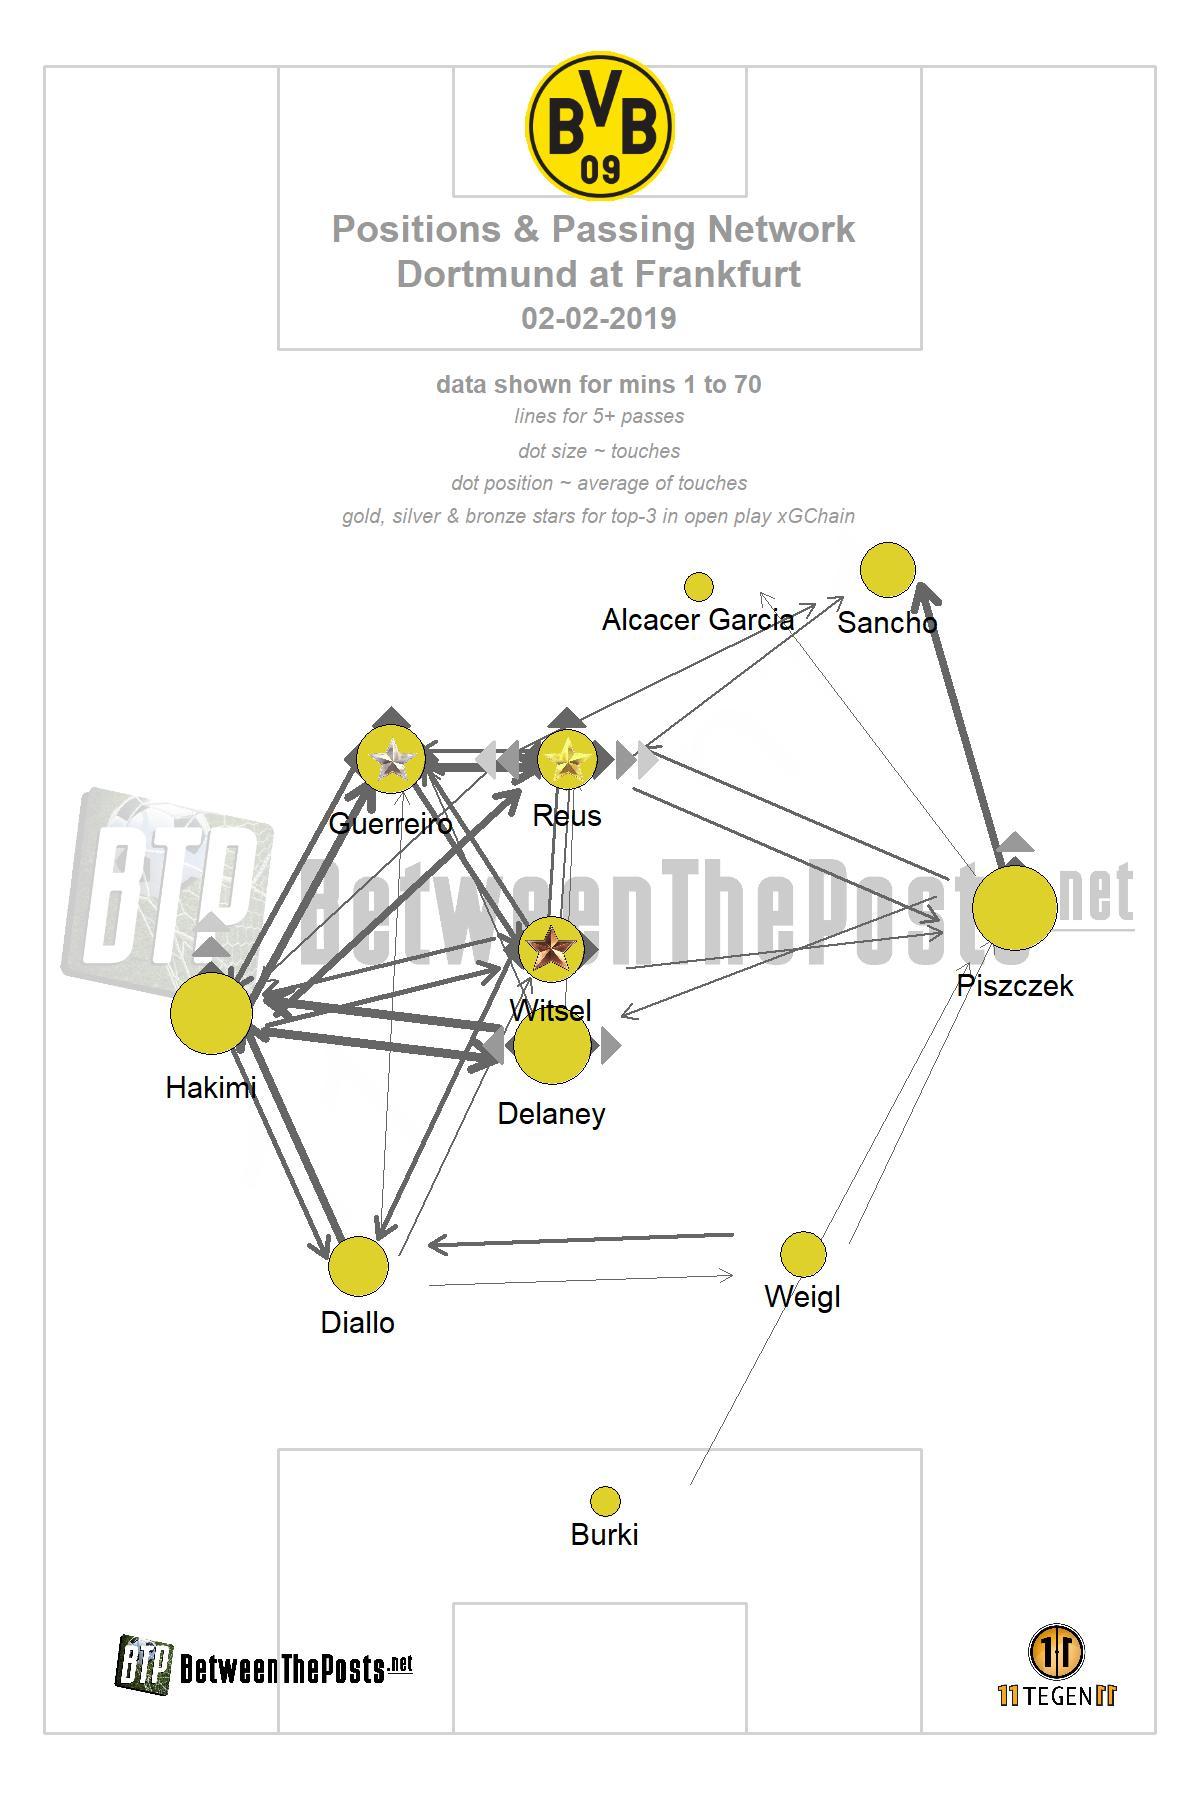 Passmap Eintracht Frankfurt - Borussia Dortmund 1-1 Bundesliga